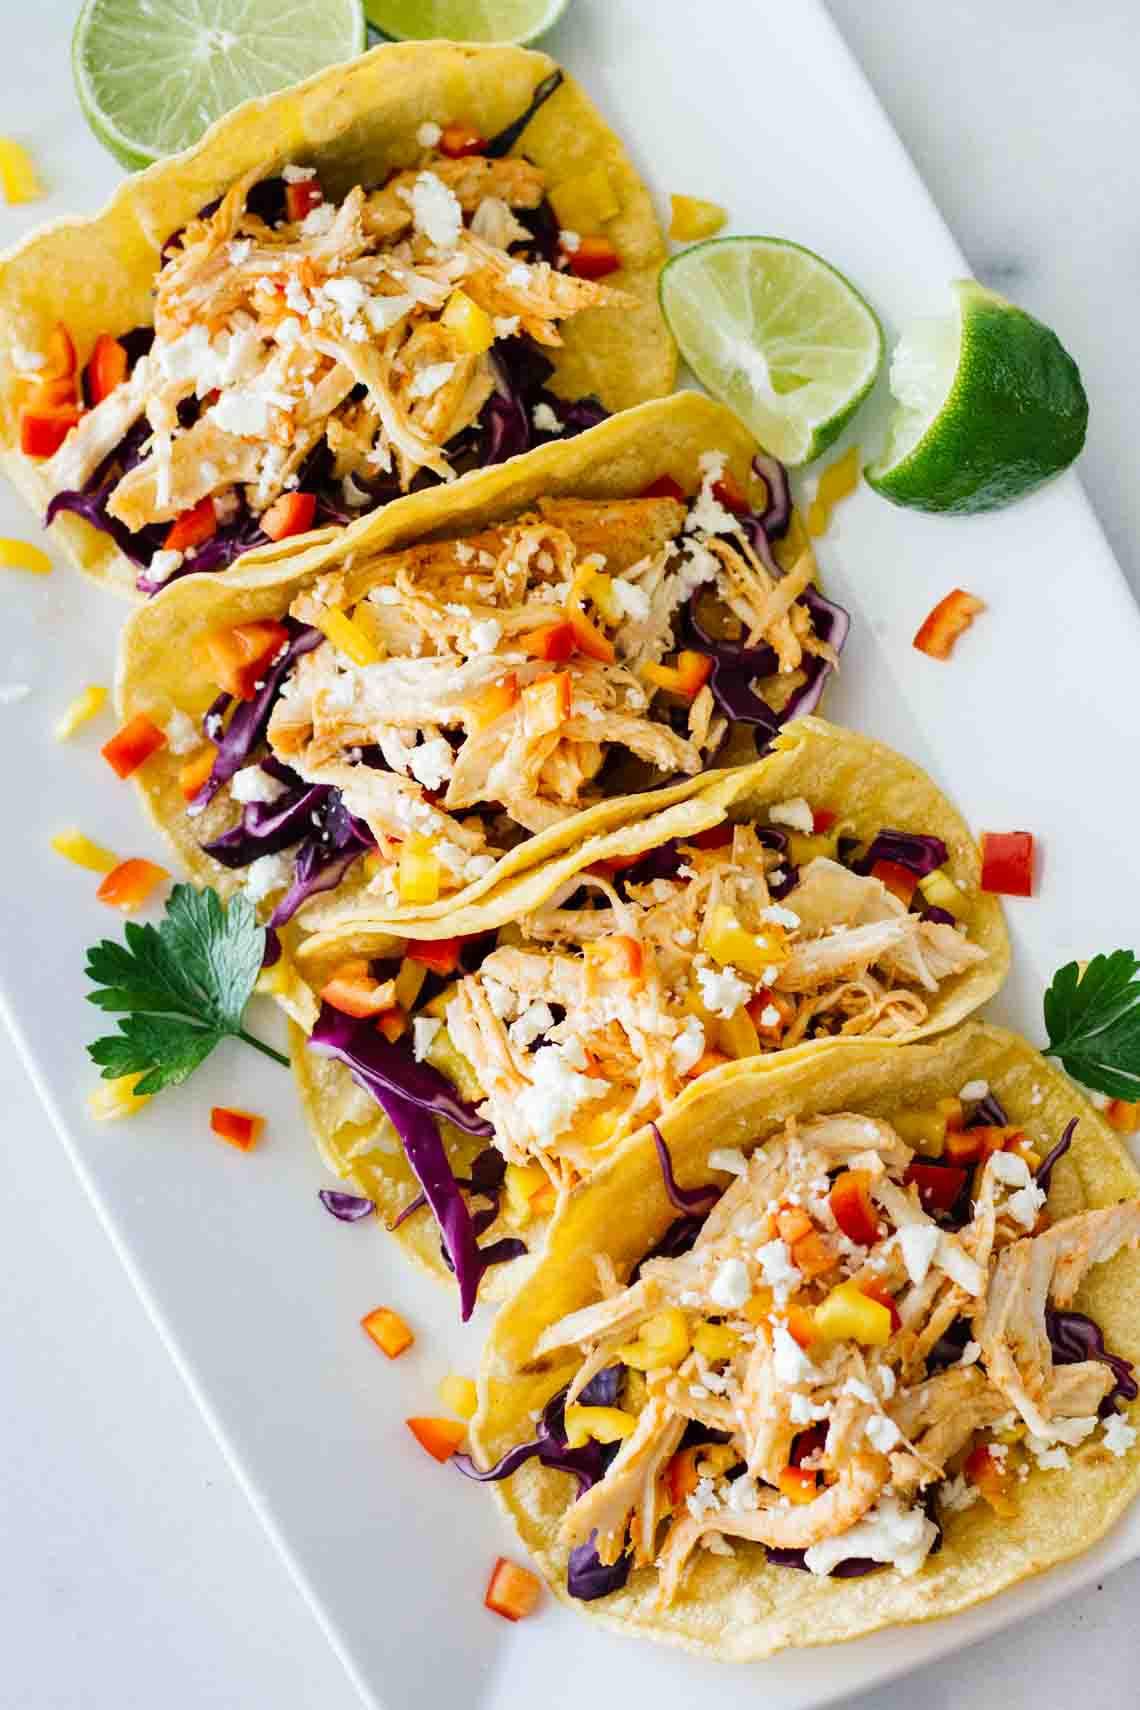 Healthy Quick Dinners  Healthy Sriracha Shredded Chicken Tacos Jar Lemons